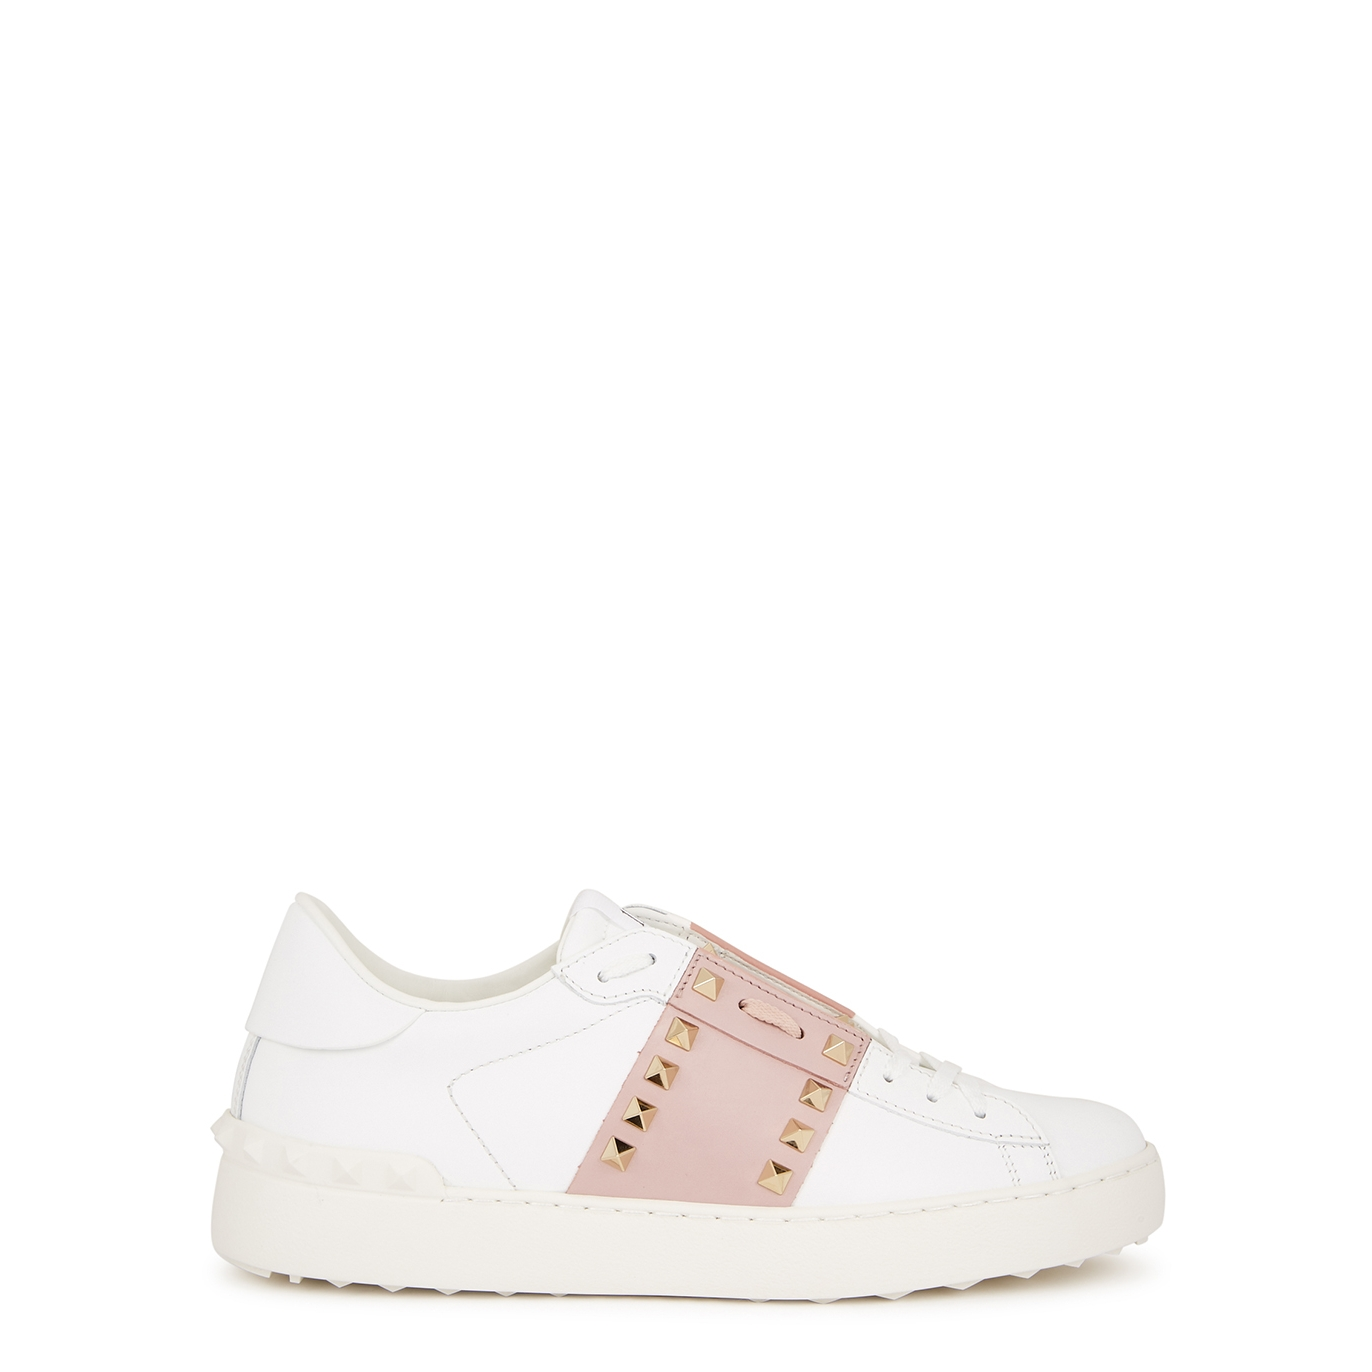 Valentino Garavani Rockstud Untitled white leather sneakers